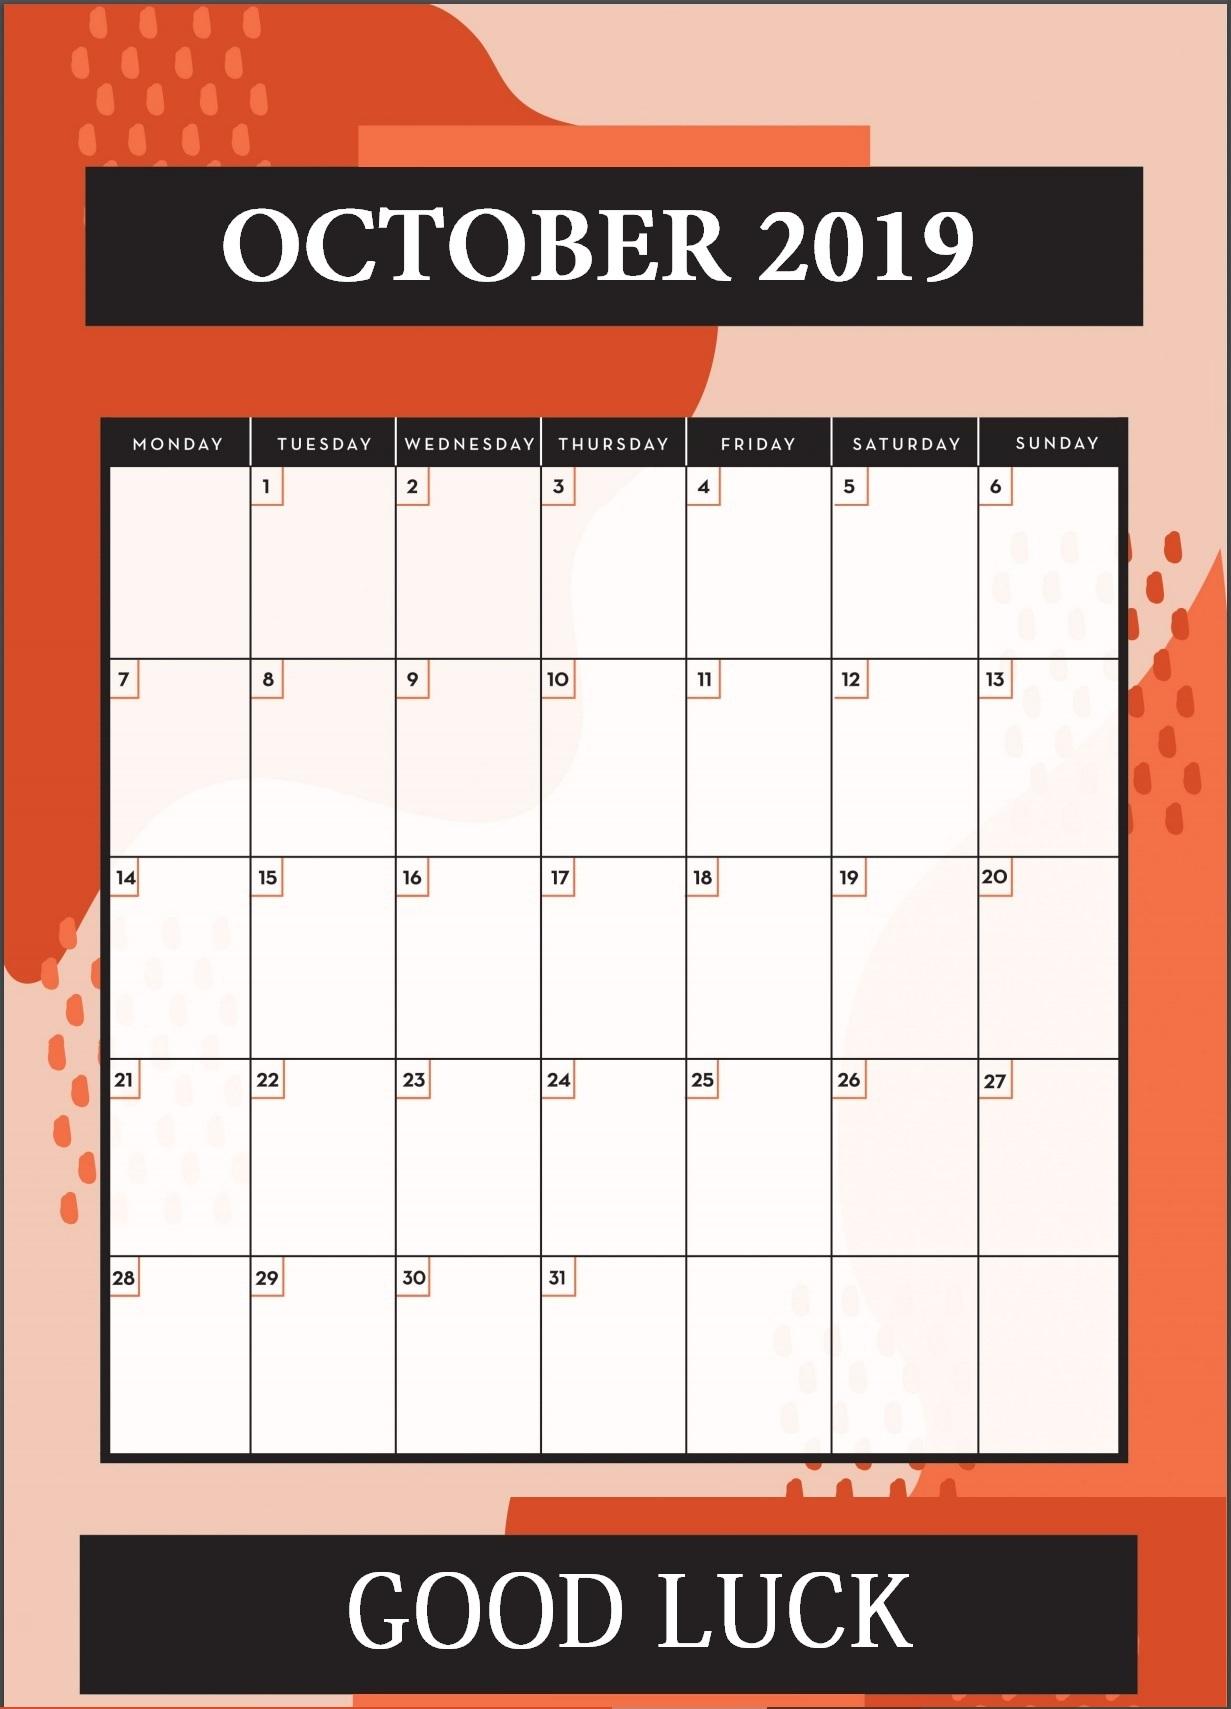 Cute October 2019 Calendar for iPhone